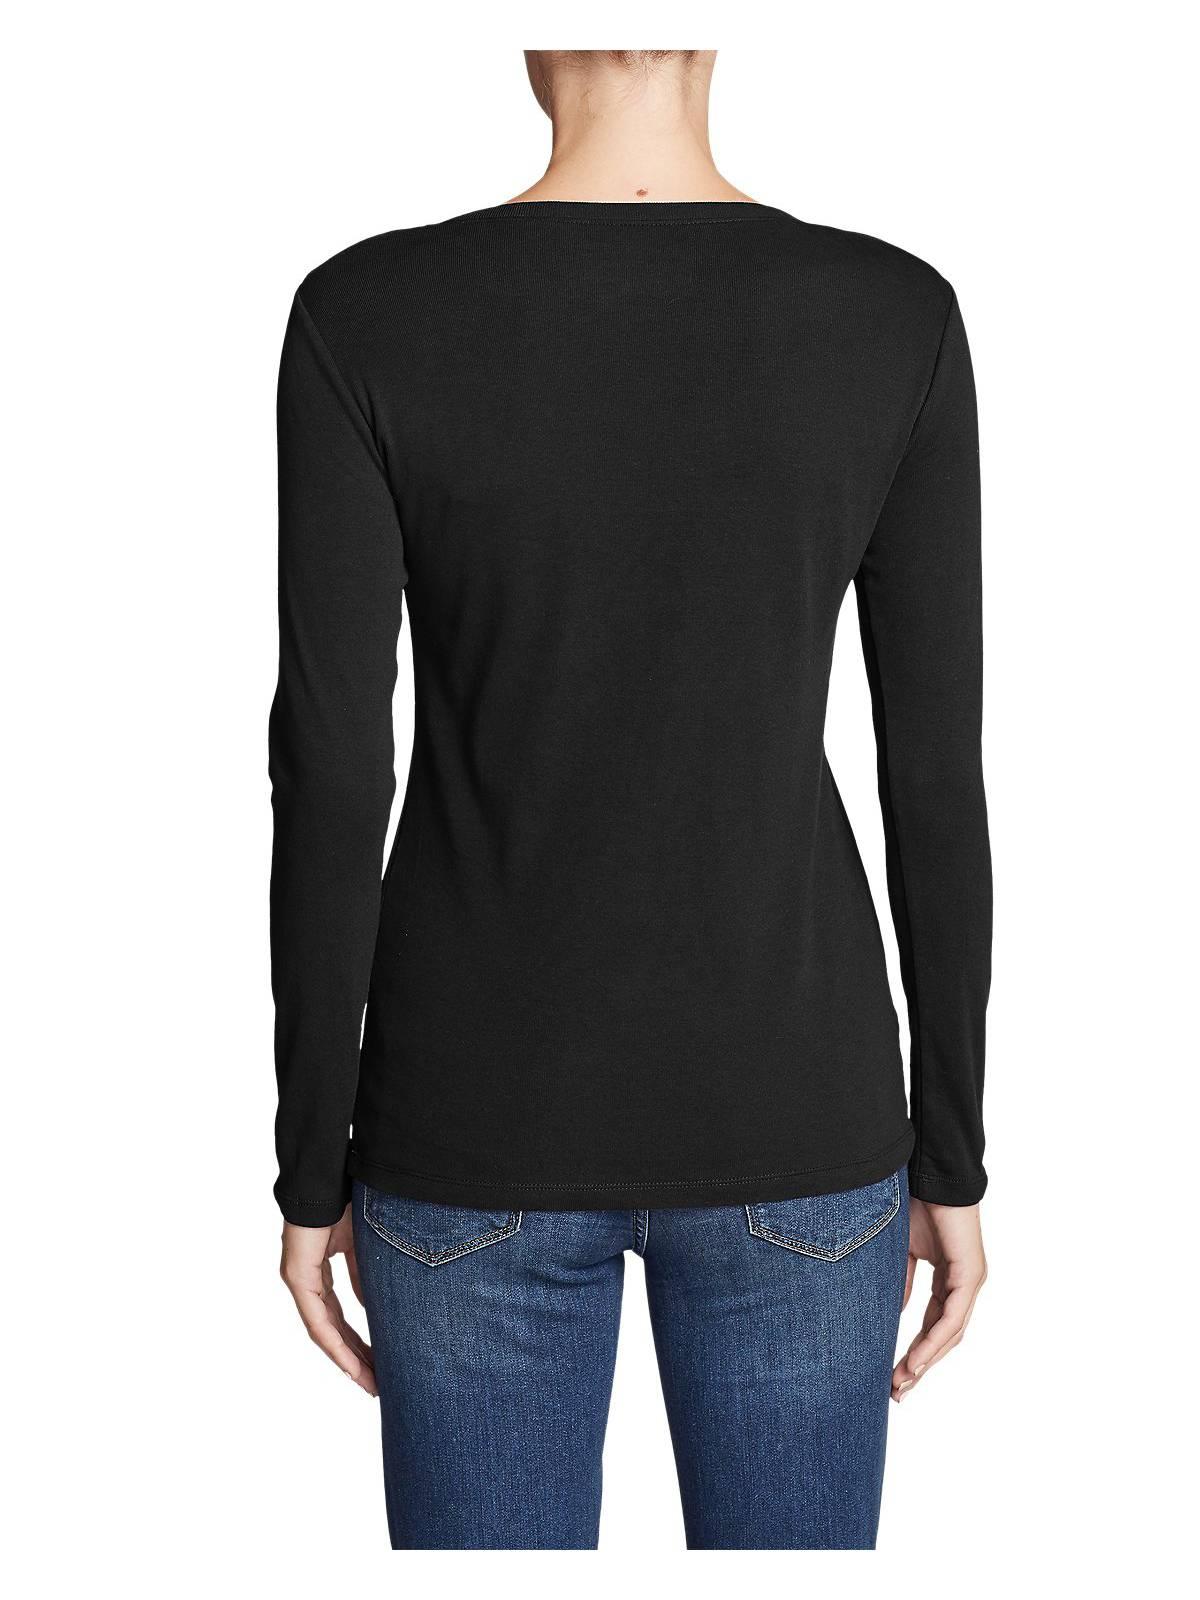 Eddie-Bauer-Women-039-s-Favorite-Long-Sleeve-Crewneck-T-Shirt thumbnail 8